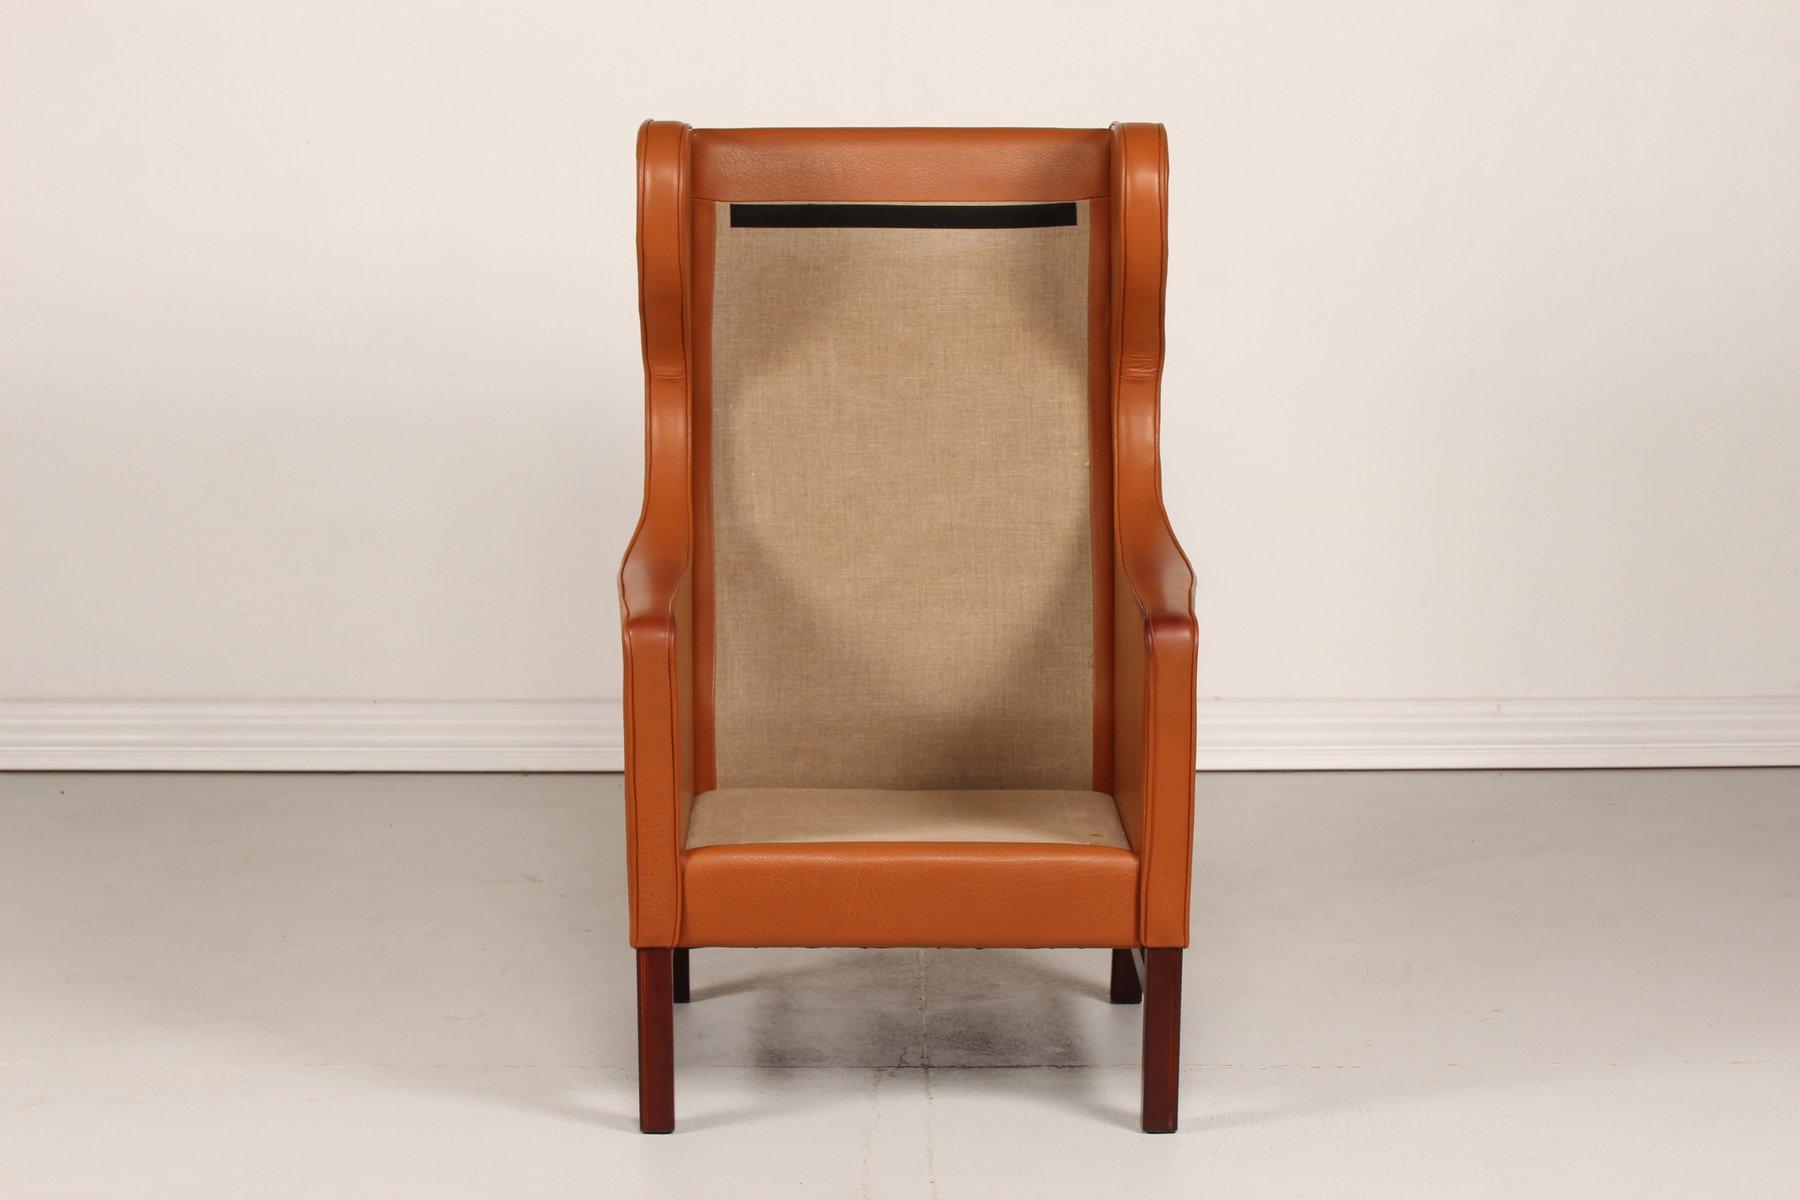 d nischer sessel mit hoher r ckenlehne in cognacfarbenem. Black Bedroom Furniture Sets. Home Design Ideas